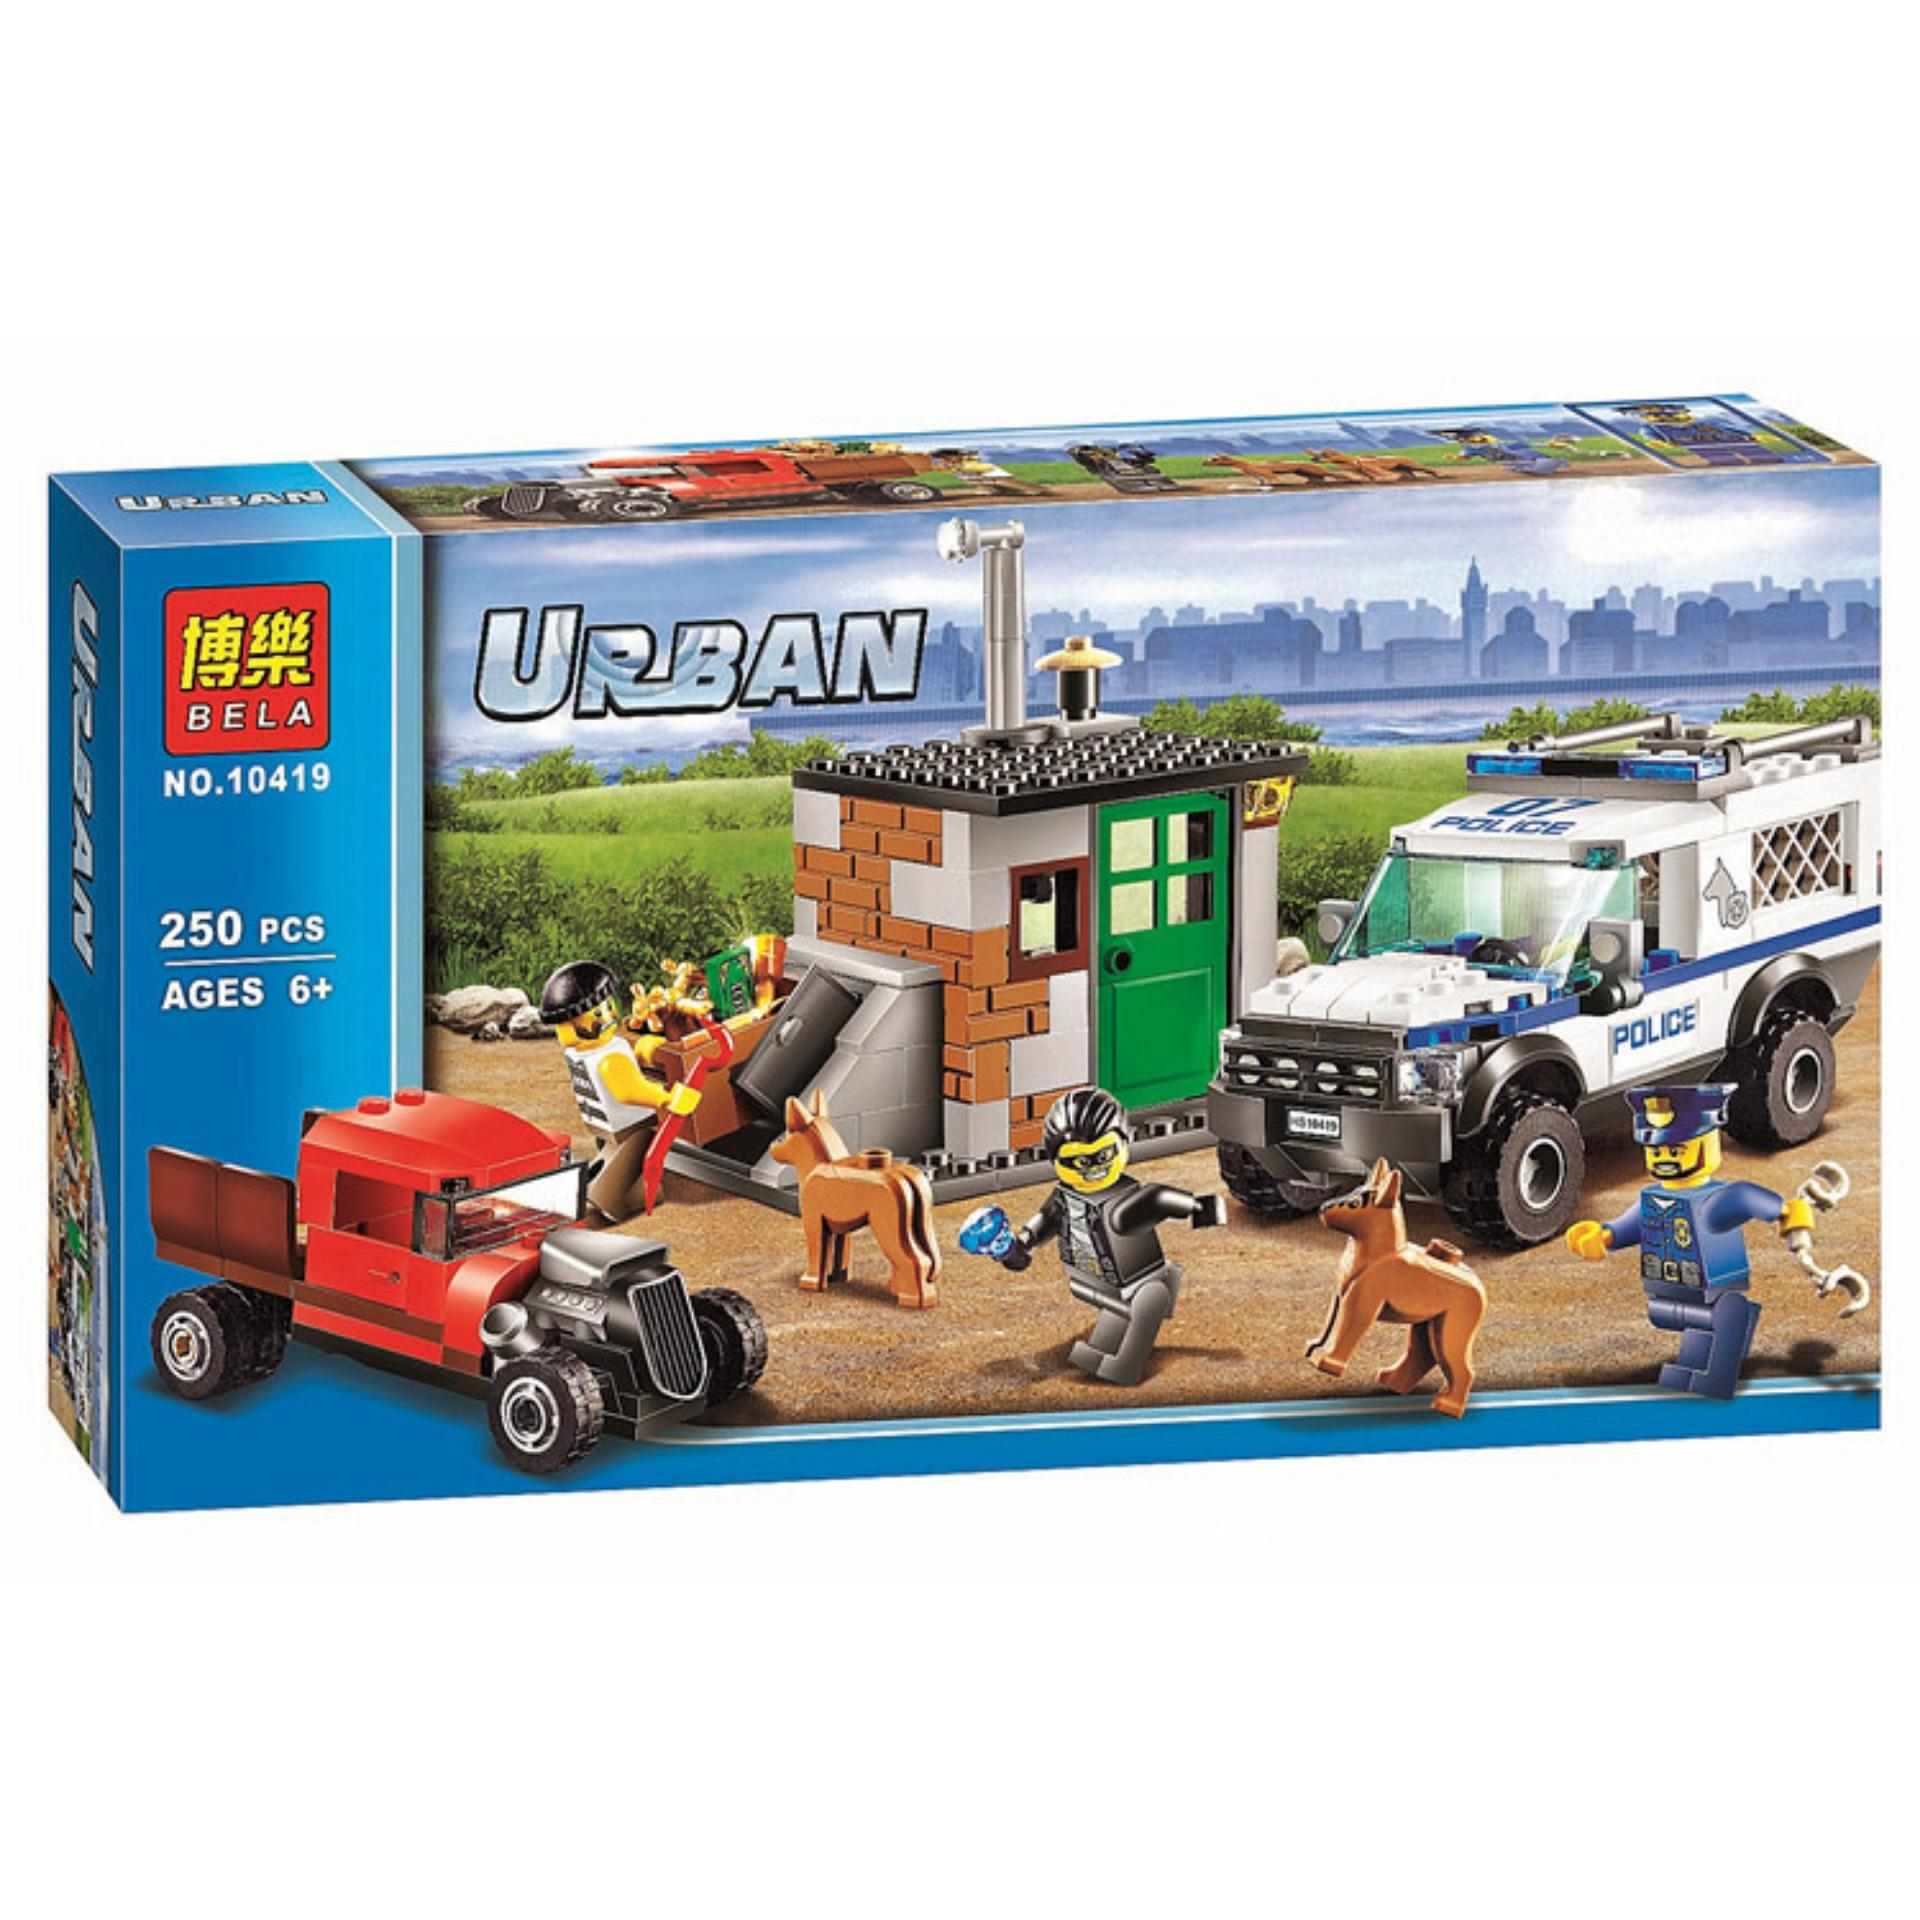 Tomindo Block Lego Bela Urban Police Series 10419